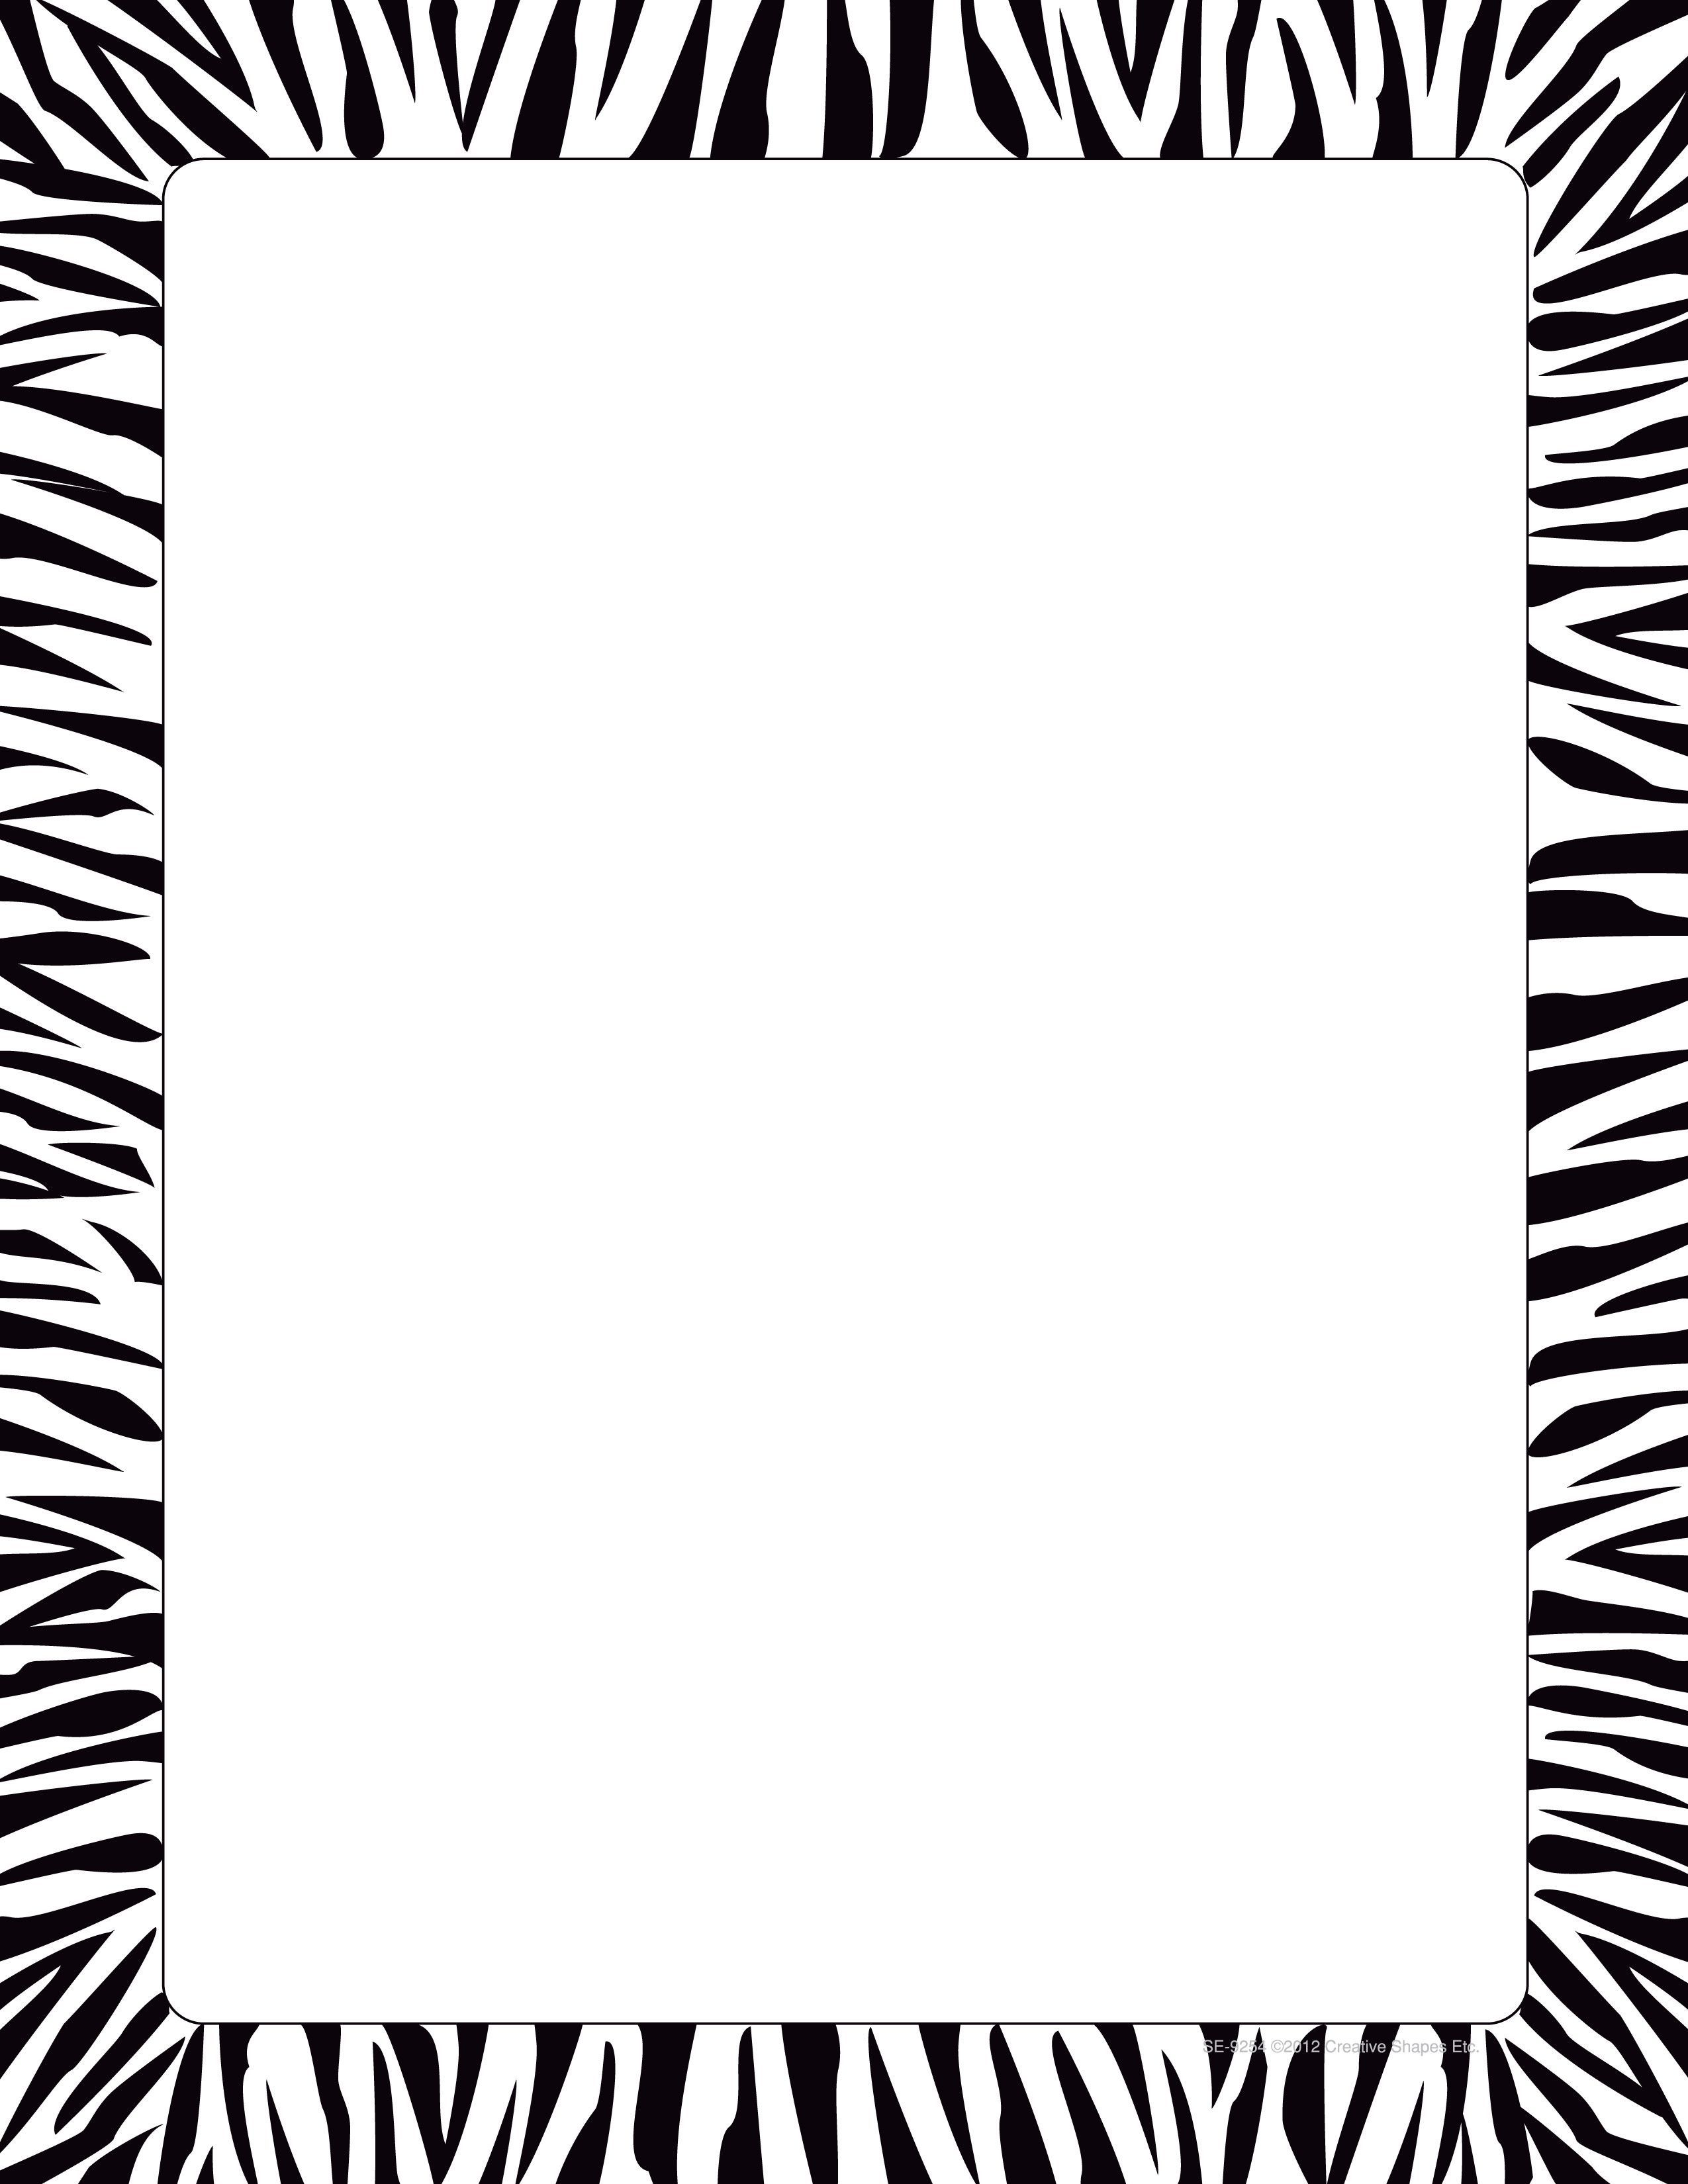 Sheet Zebra Paper Designer PackageProducts Border50 On0wkP